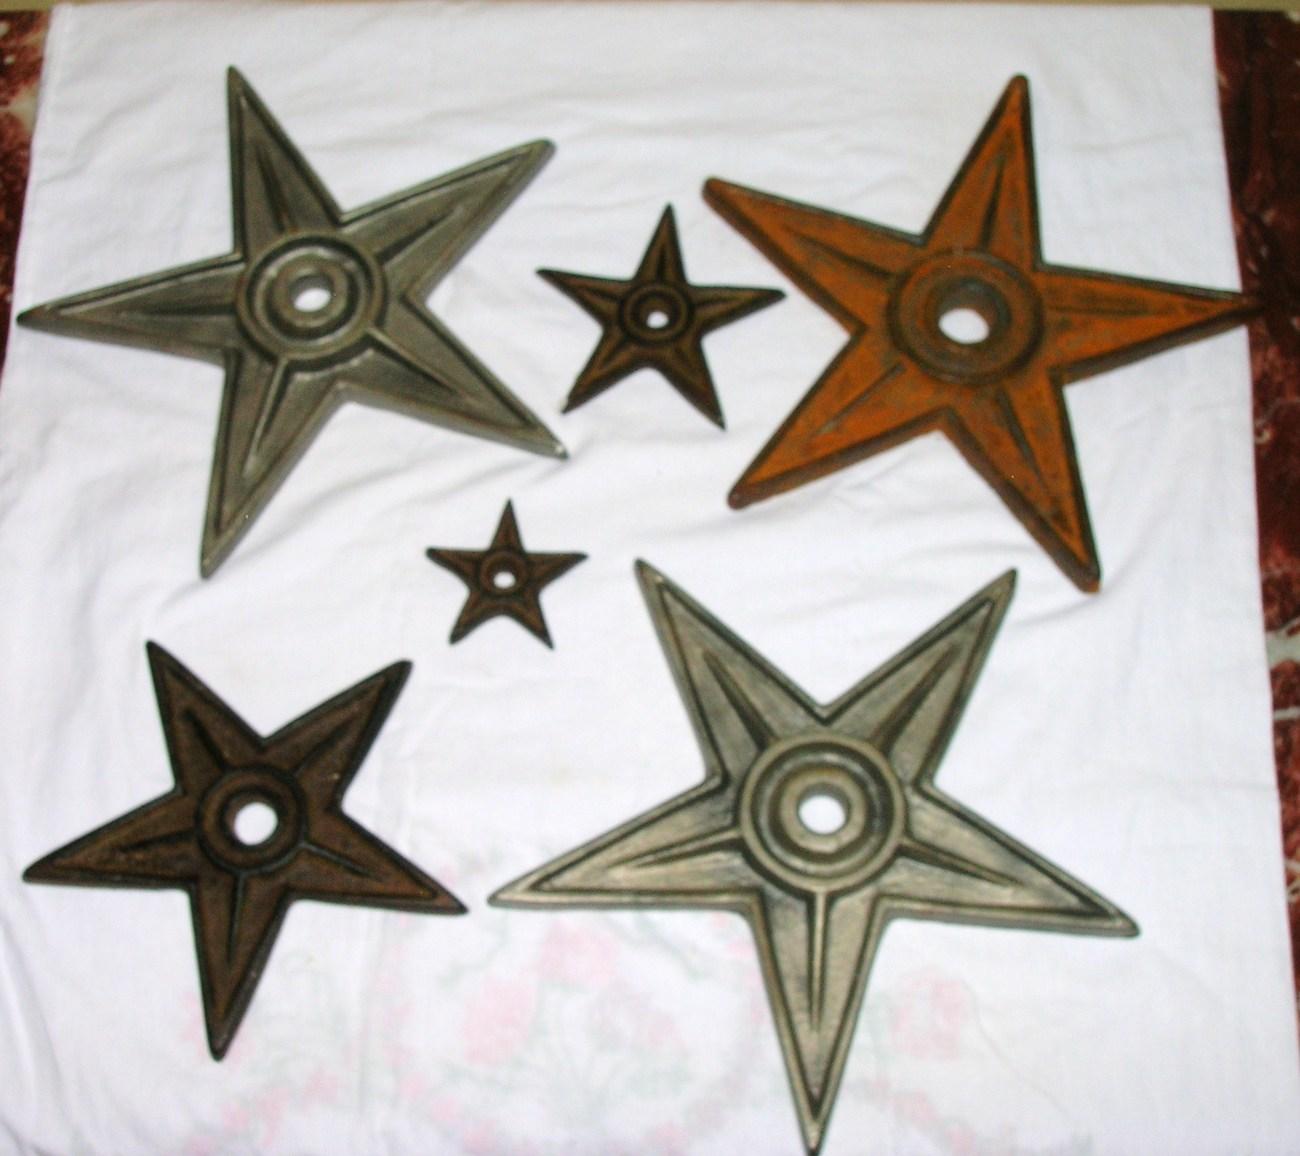 Mirrored Star Wall Decor: HEAVY CAST IRON TEXAS LONE STAR TRIVETS OR WALL DECOR LOT